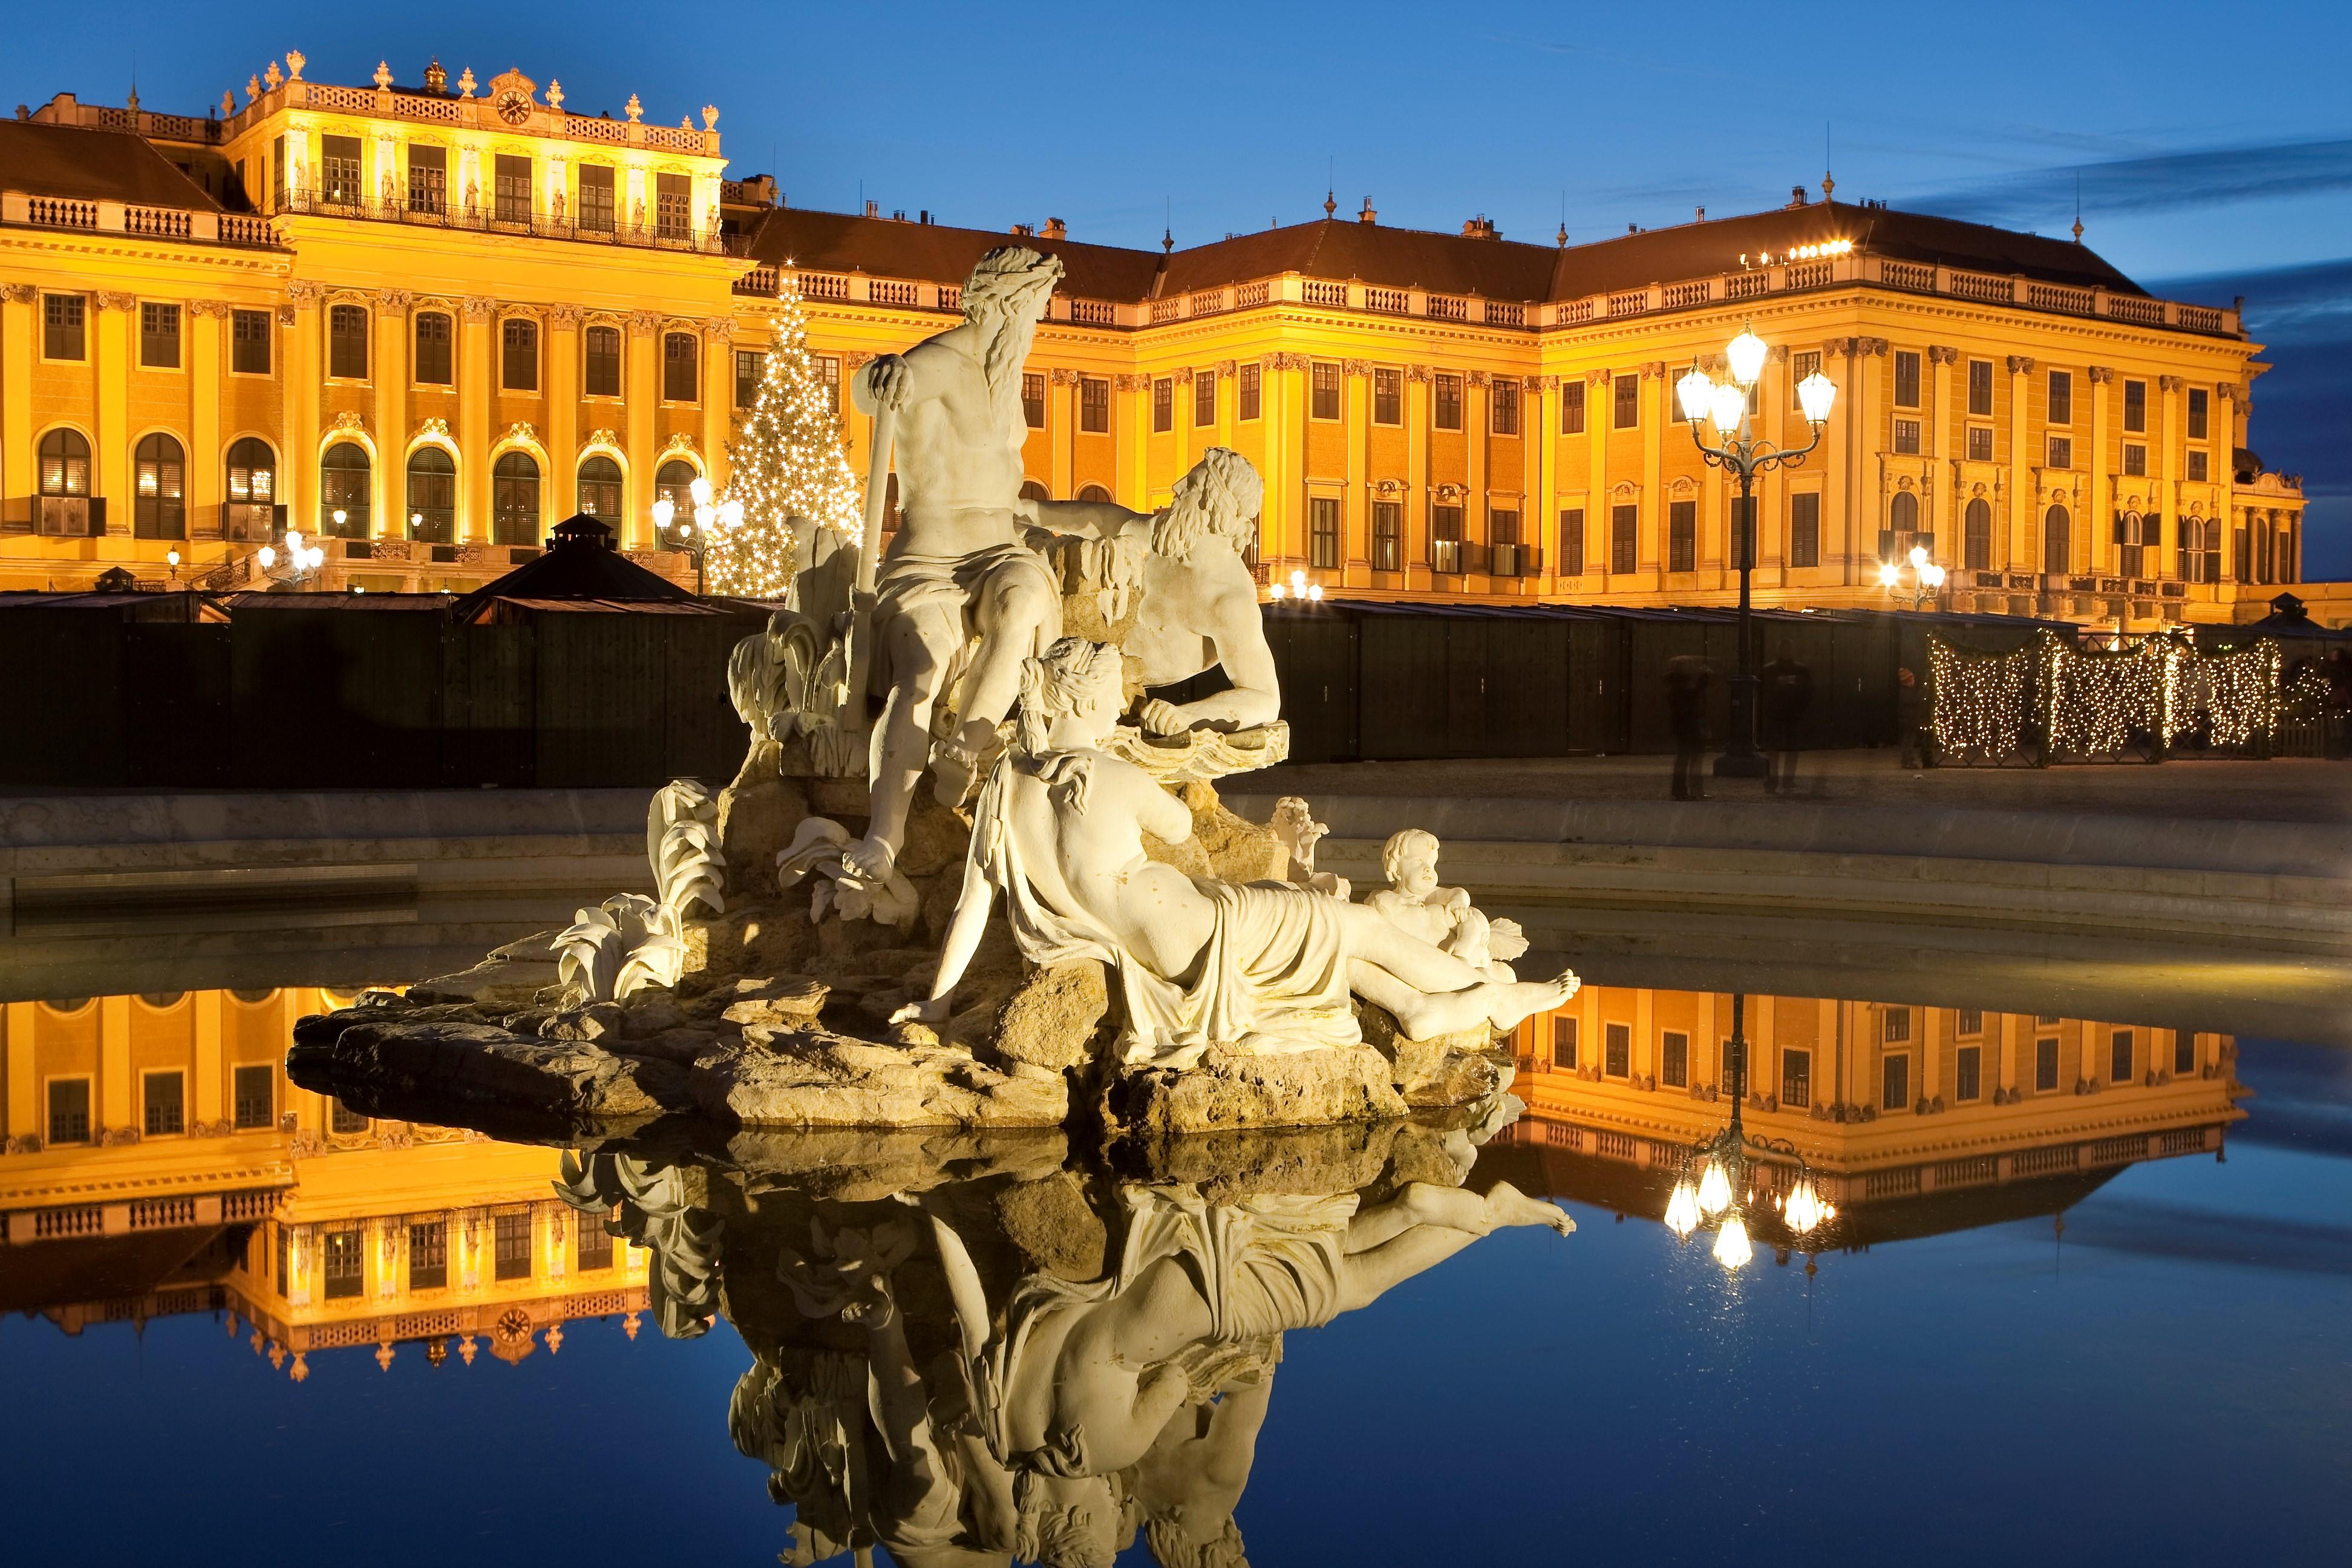 Avusturya, Viyana